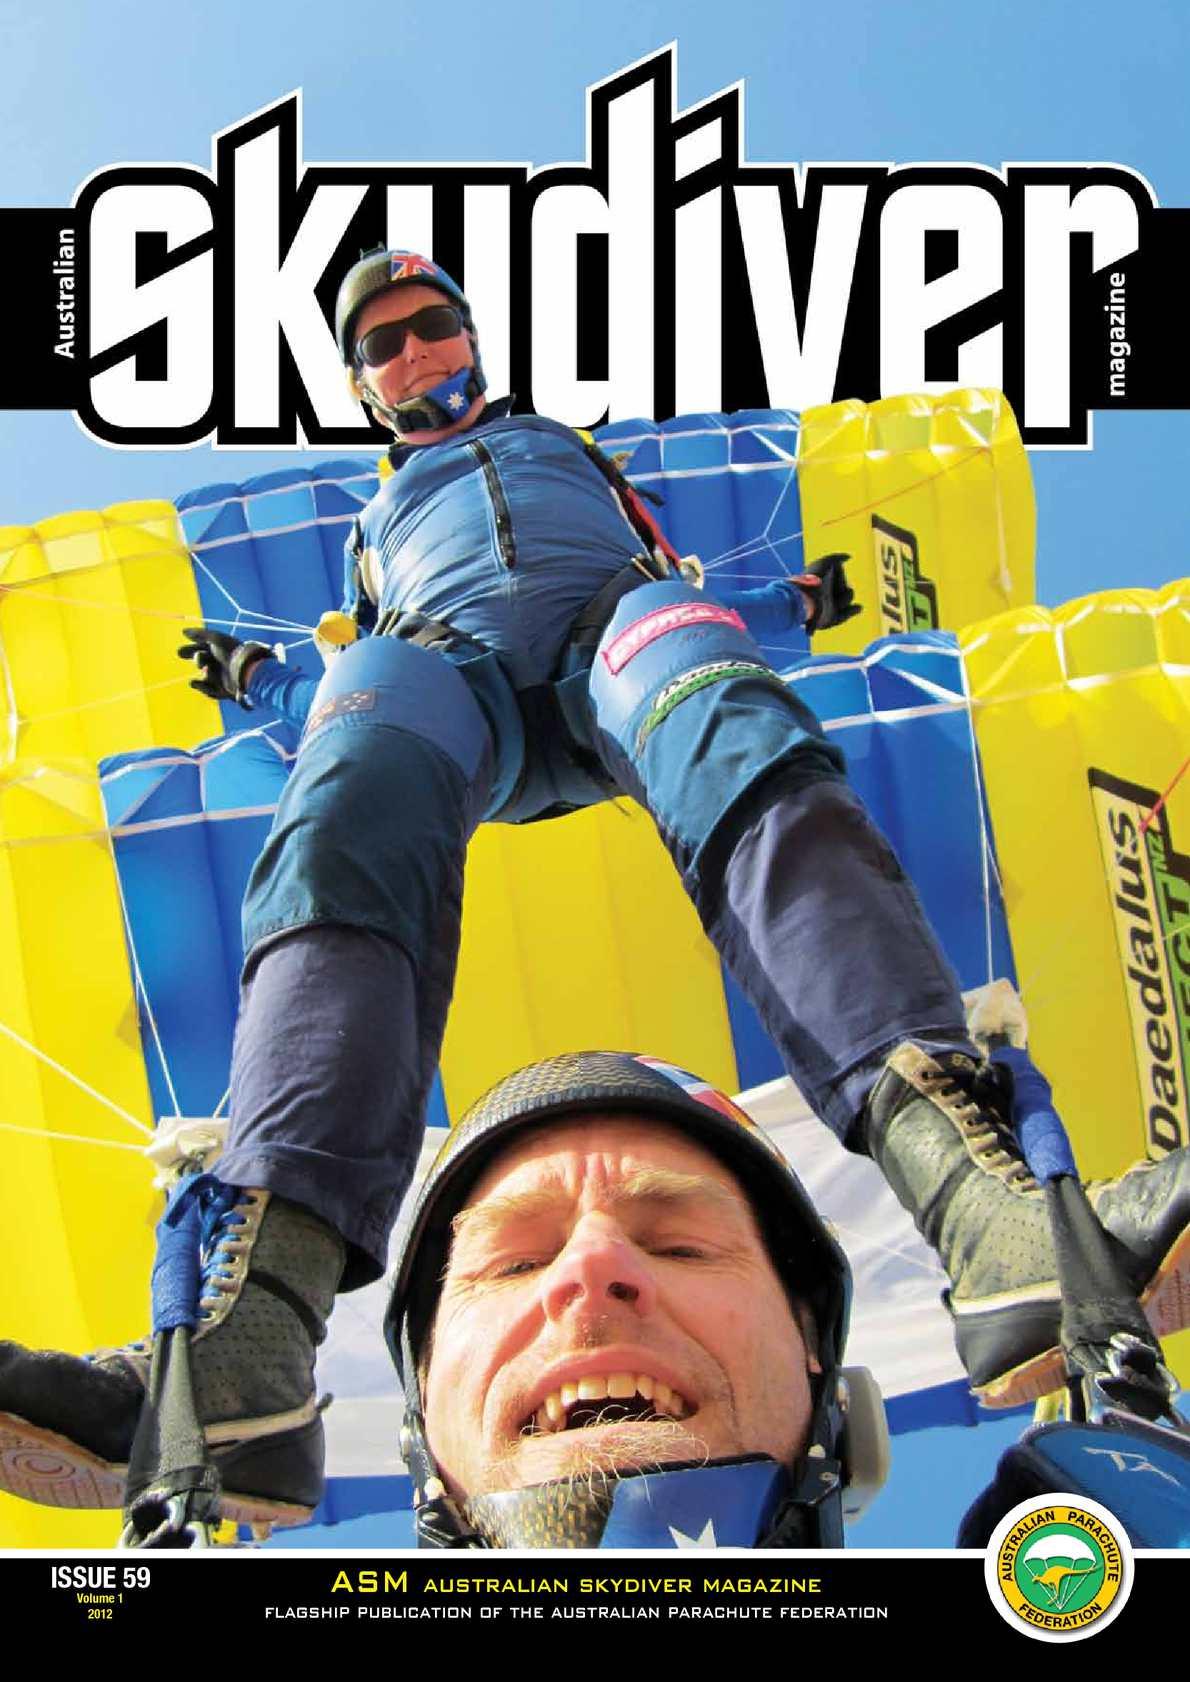 Jc Lewis Ford >> Calaméo - Australian SKYDIVER Magazine Issue 59